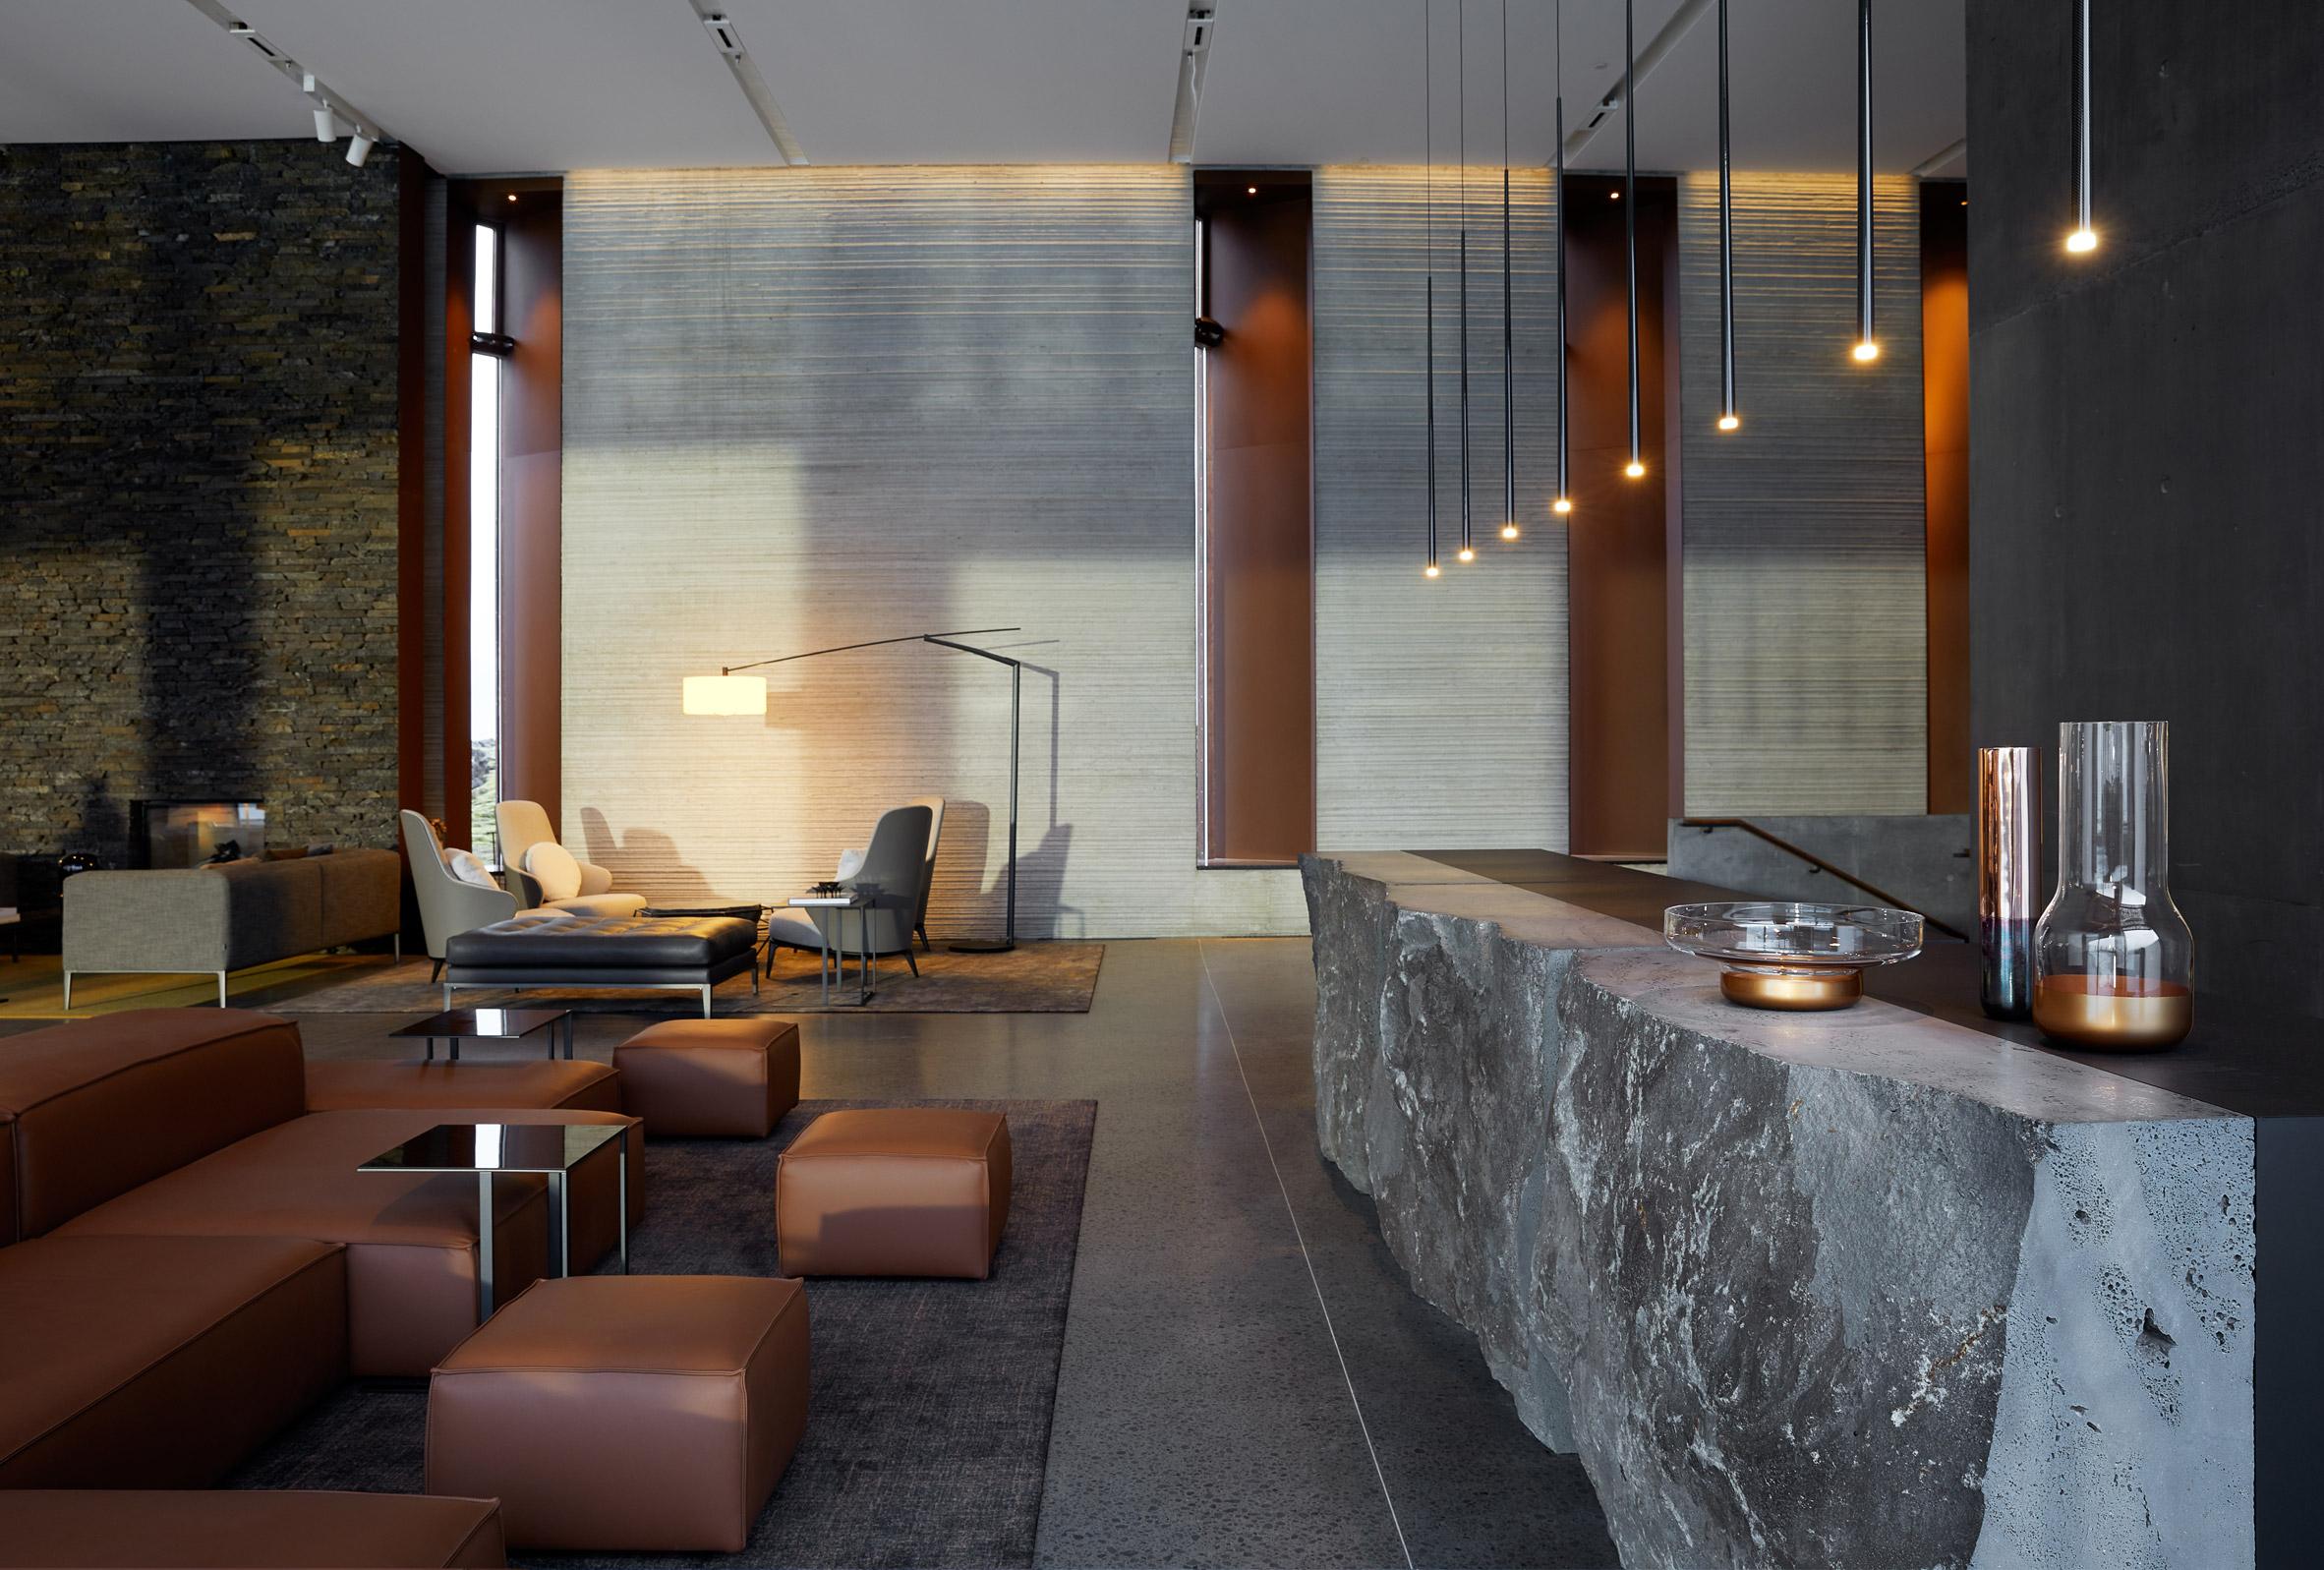 Thiết kế nội thất Resort 4